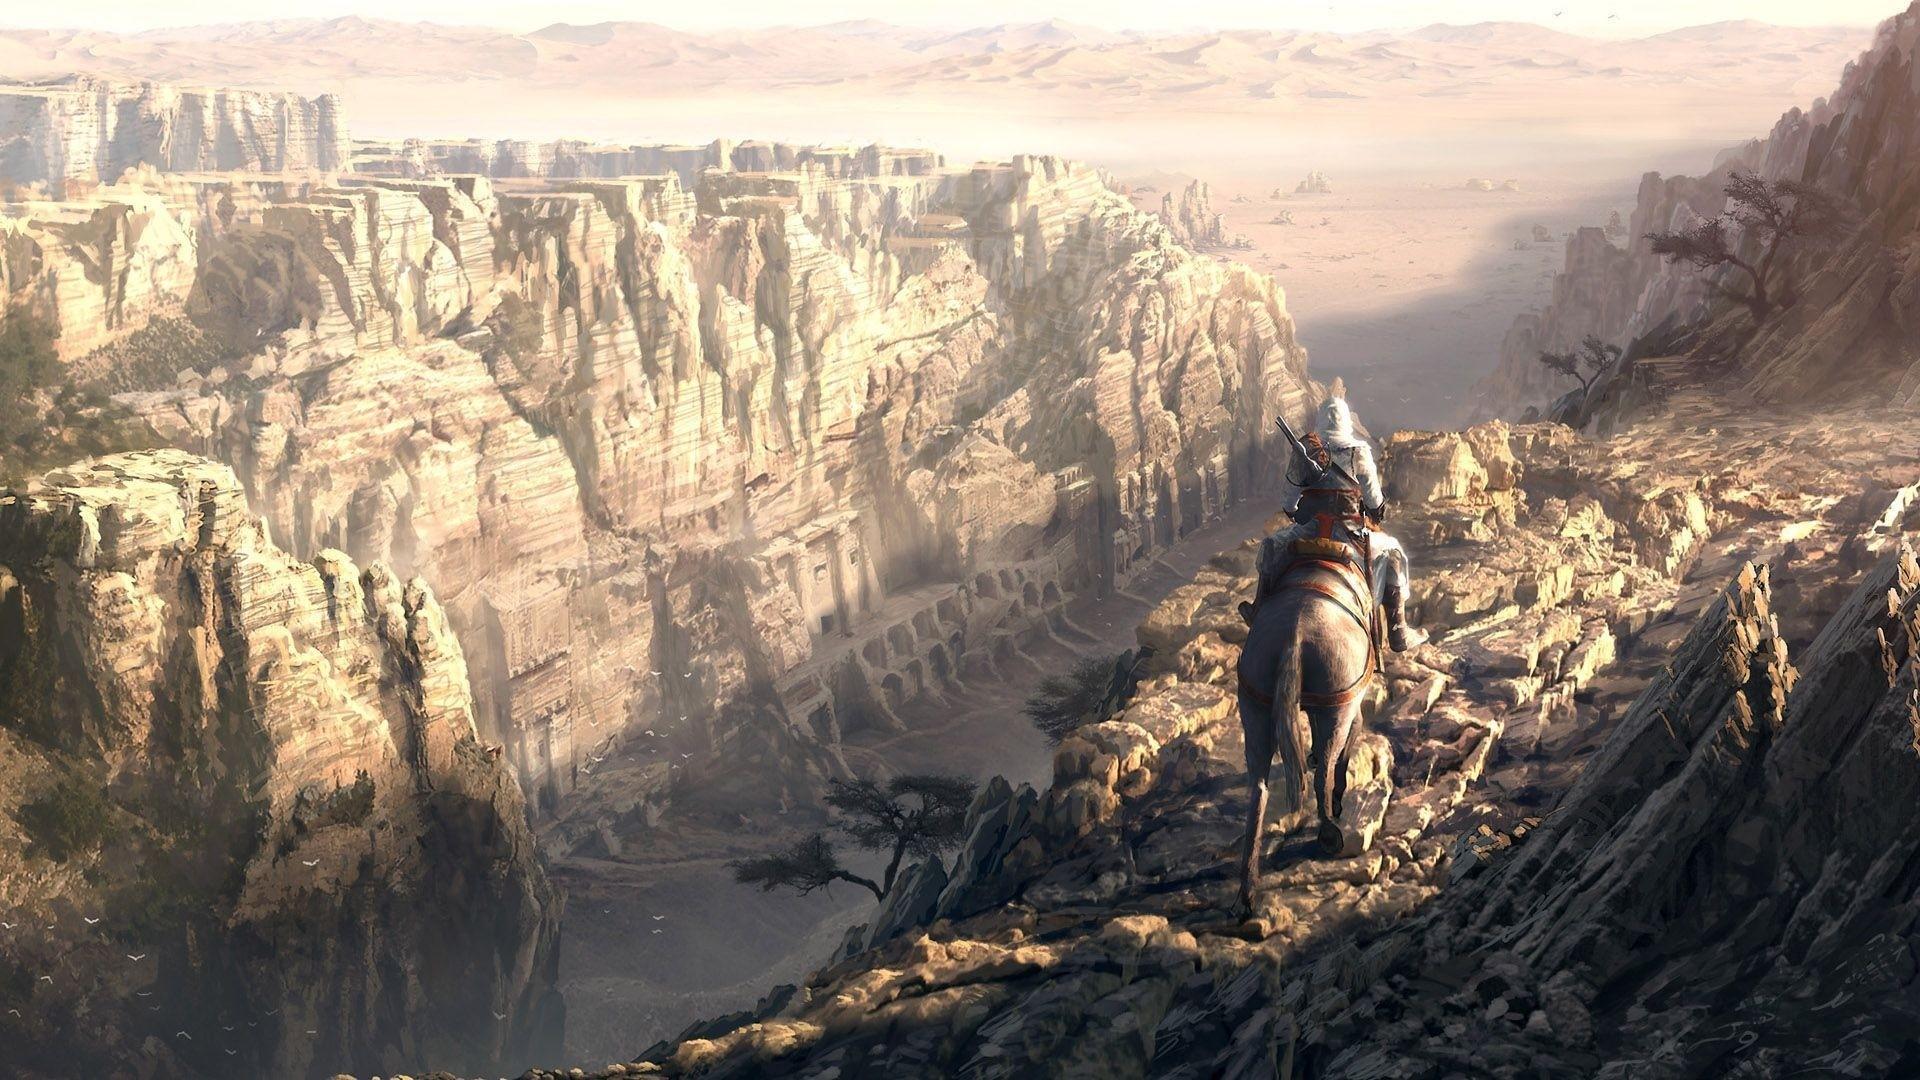 … Background Full HD 1080p. Wallpaper assassins creed, desmond  miles, canyon, desert, mountains